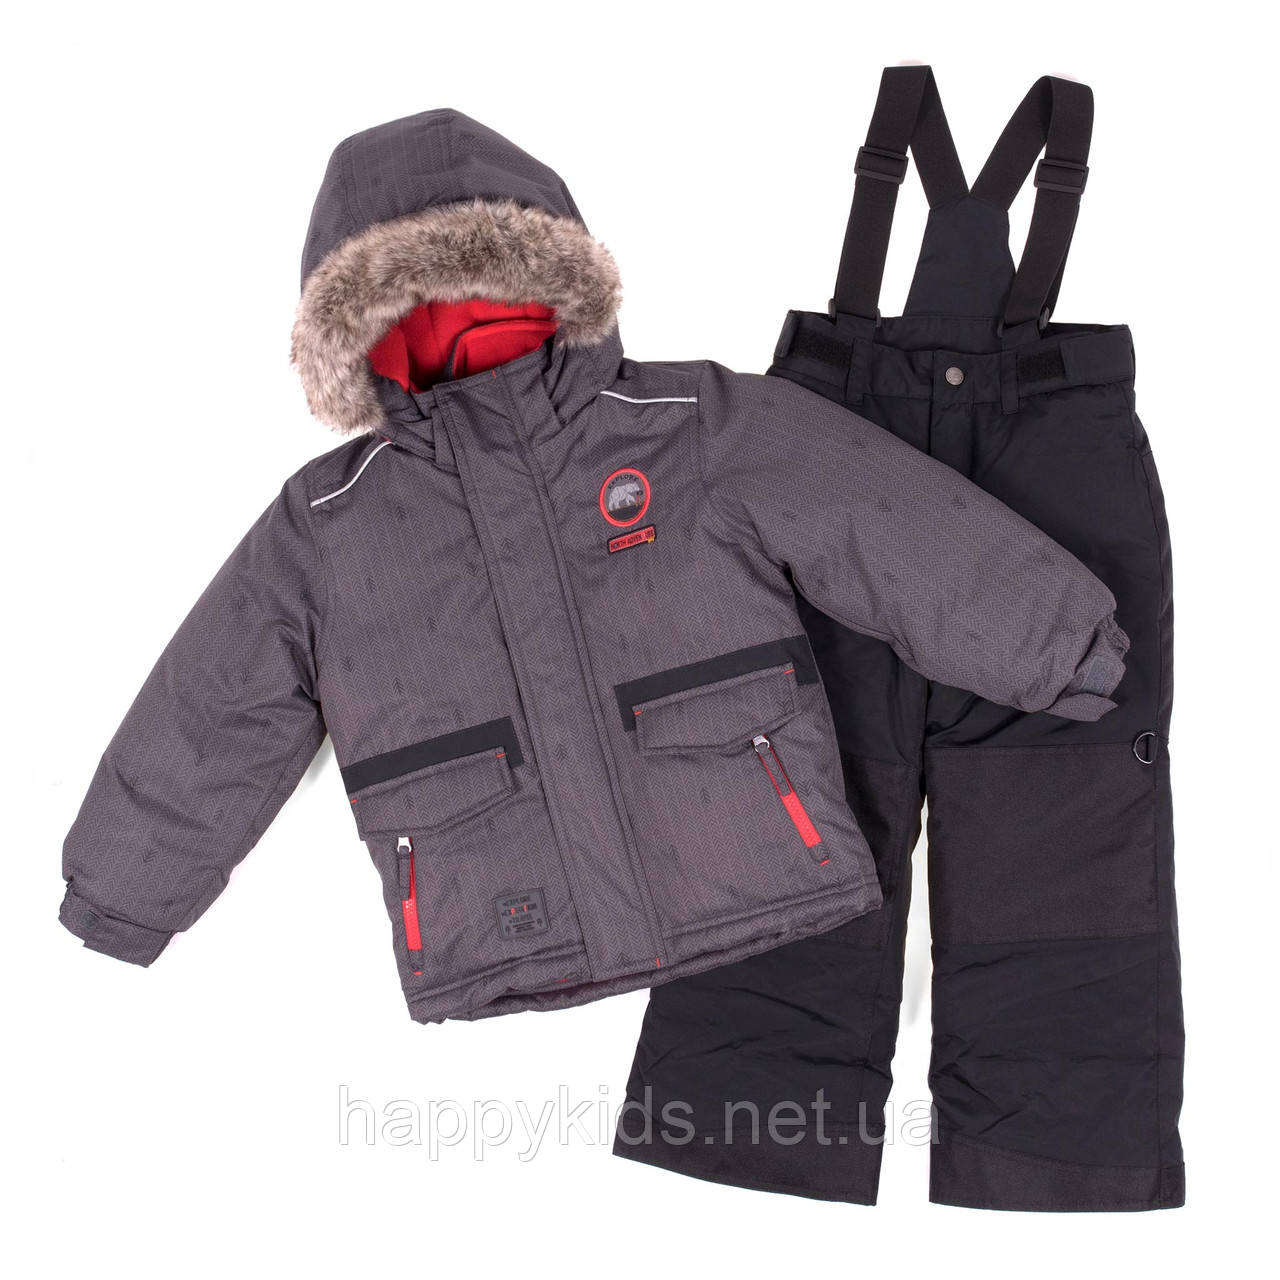 Зимний комплект для мальчика PELUCHE F18 M 53 EG Black /Black. Размеры 3-8.